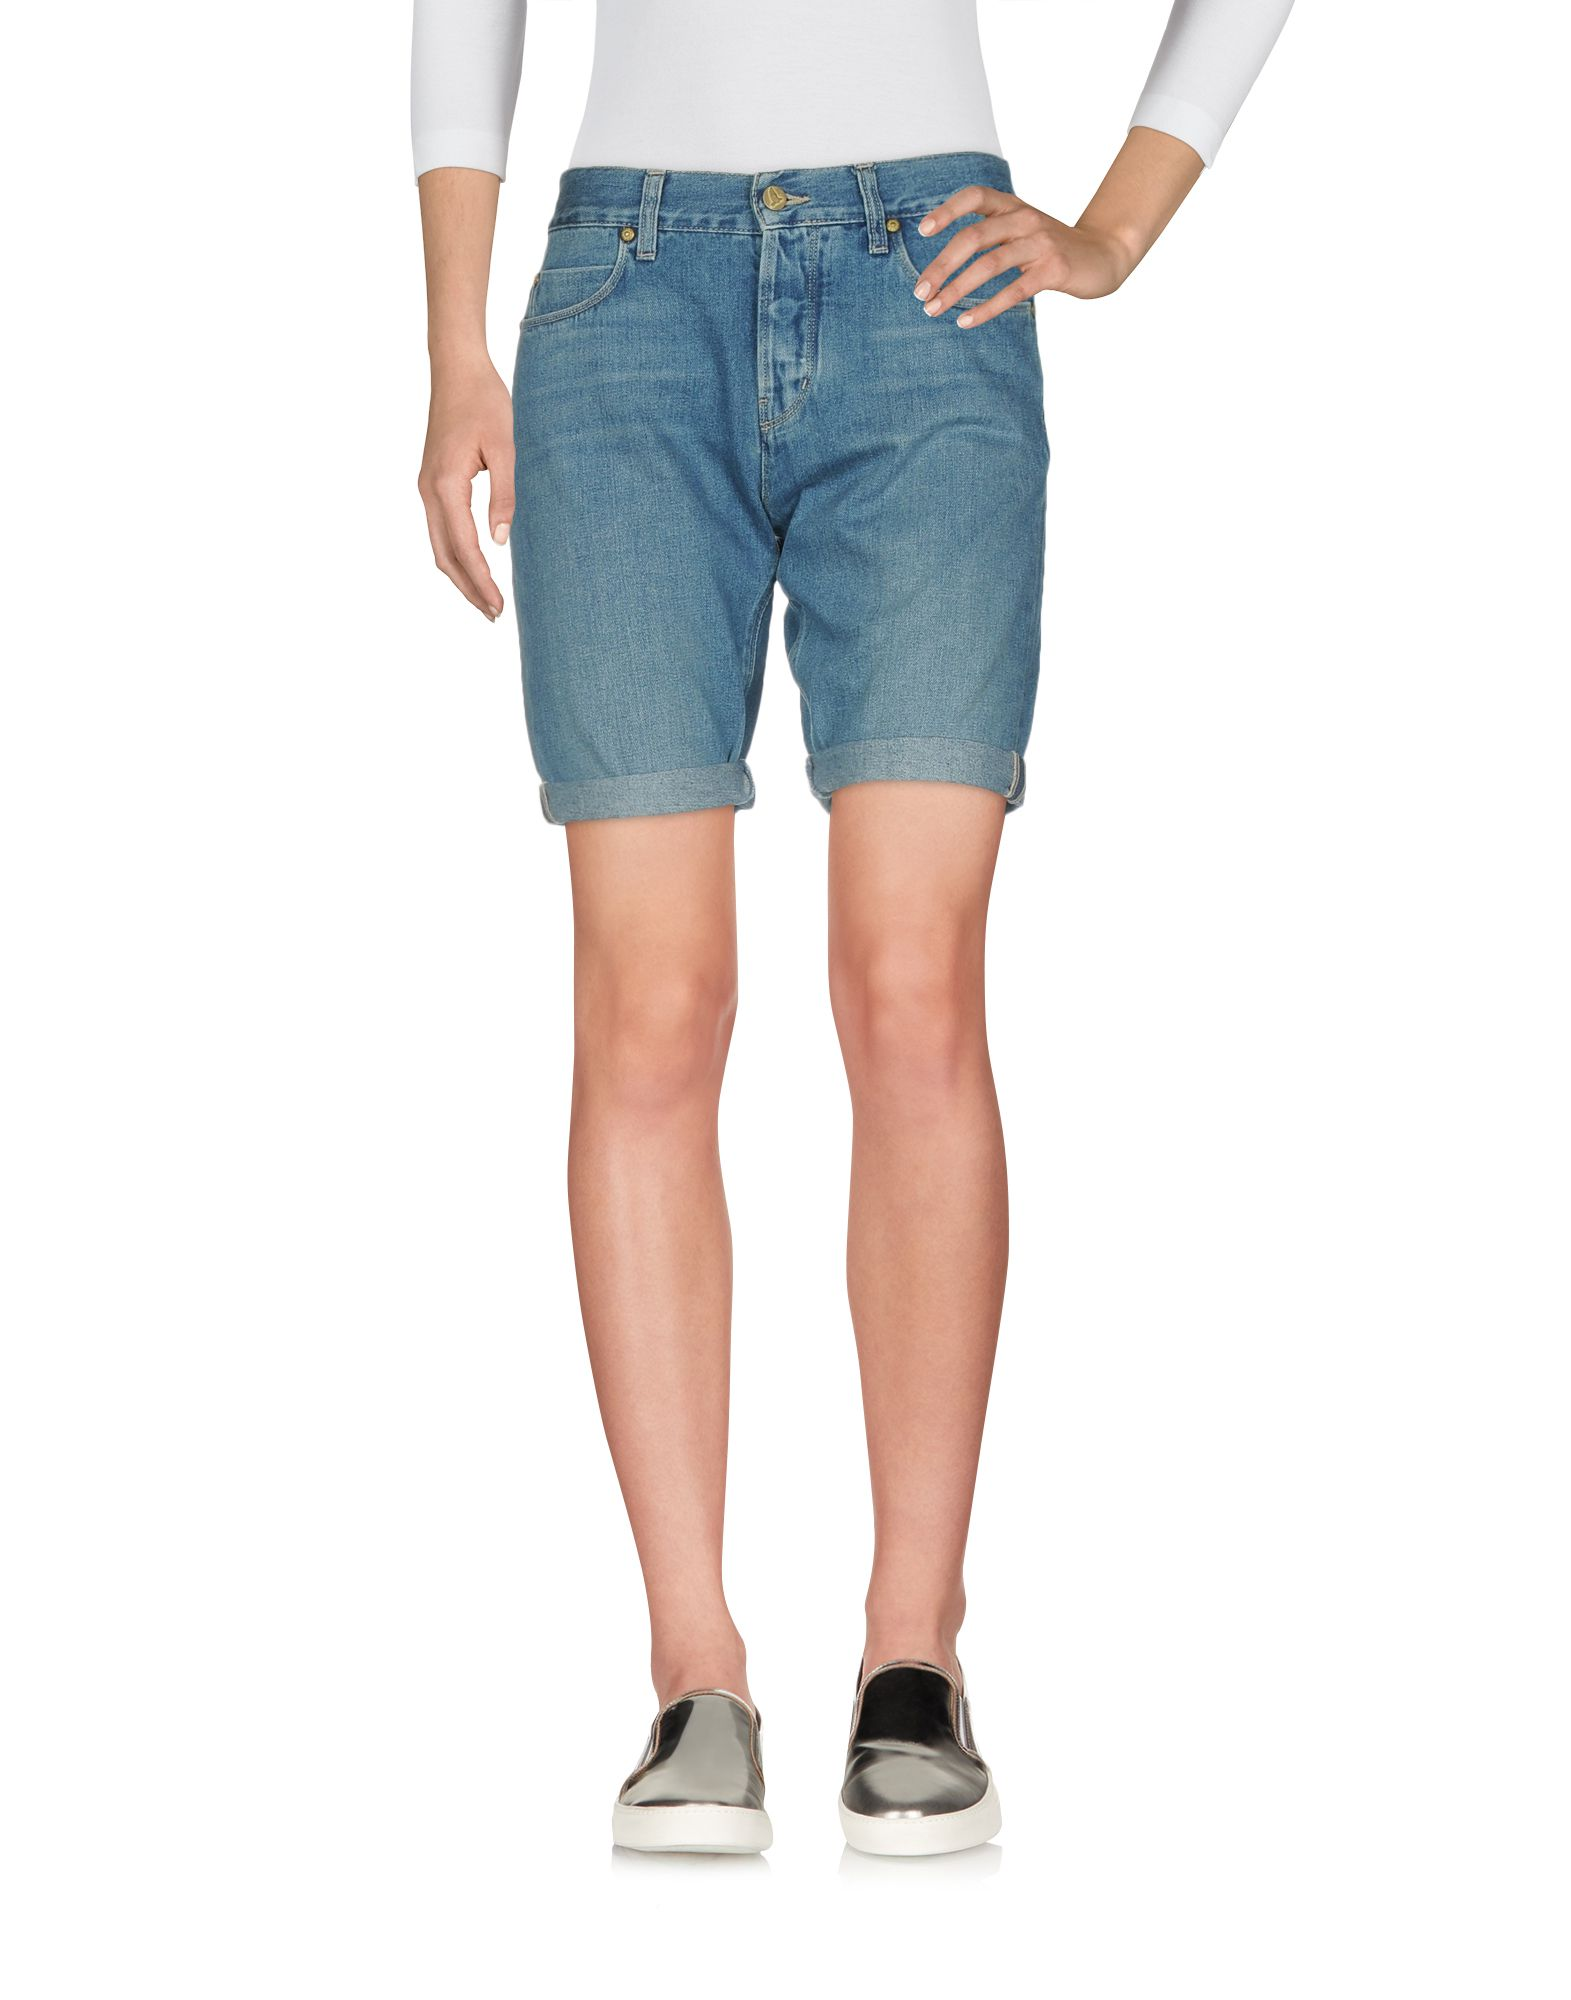 M.I.H JEANS Джинсовые бермуды masons jeans джинсовые бермуды